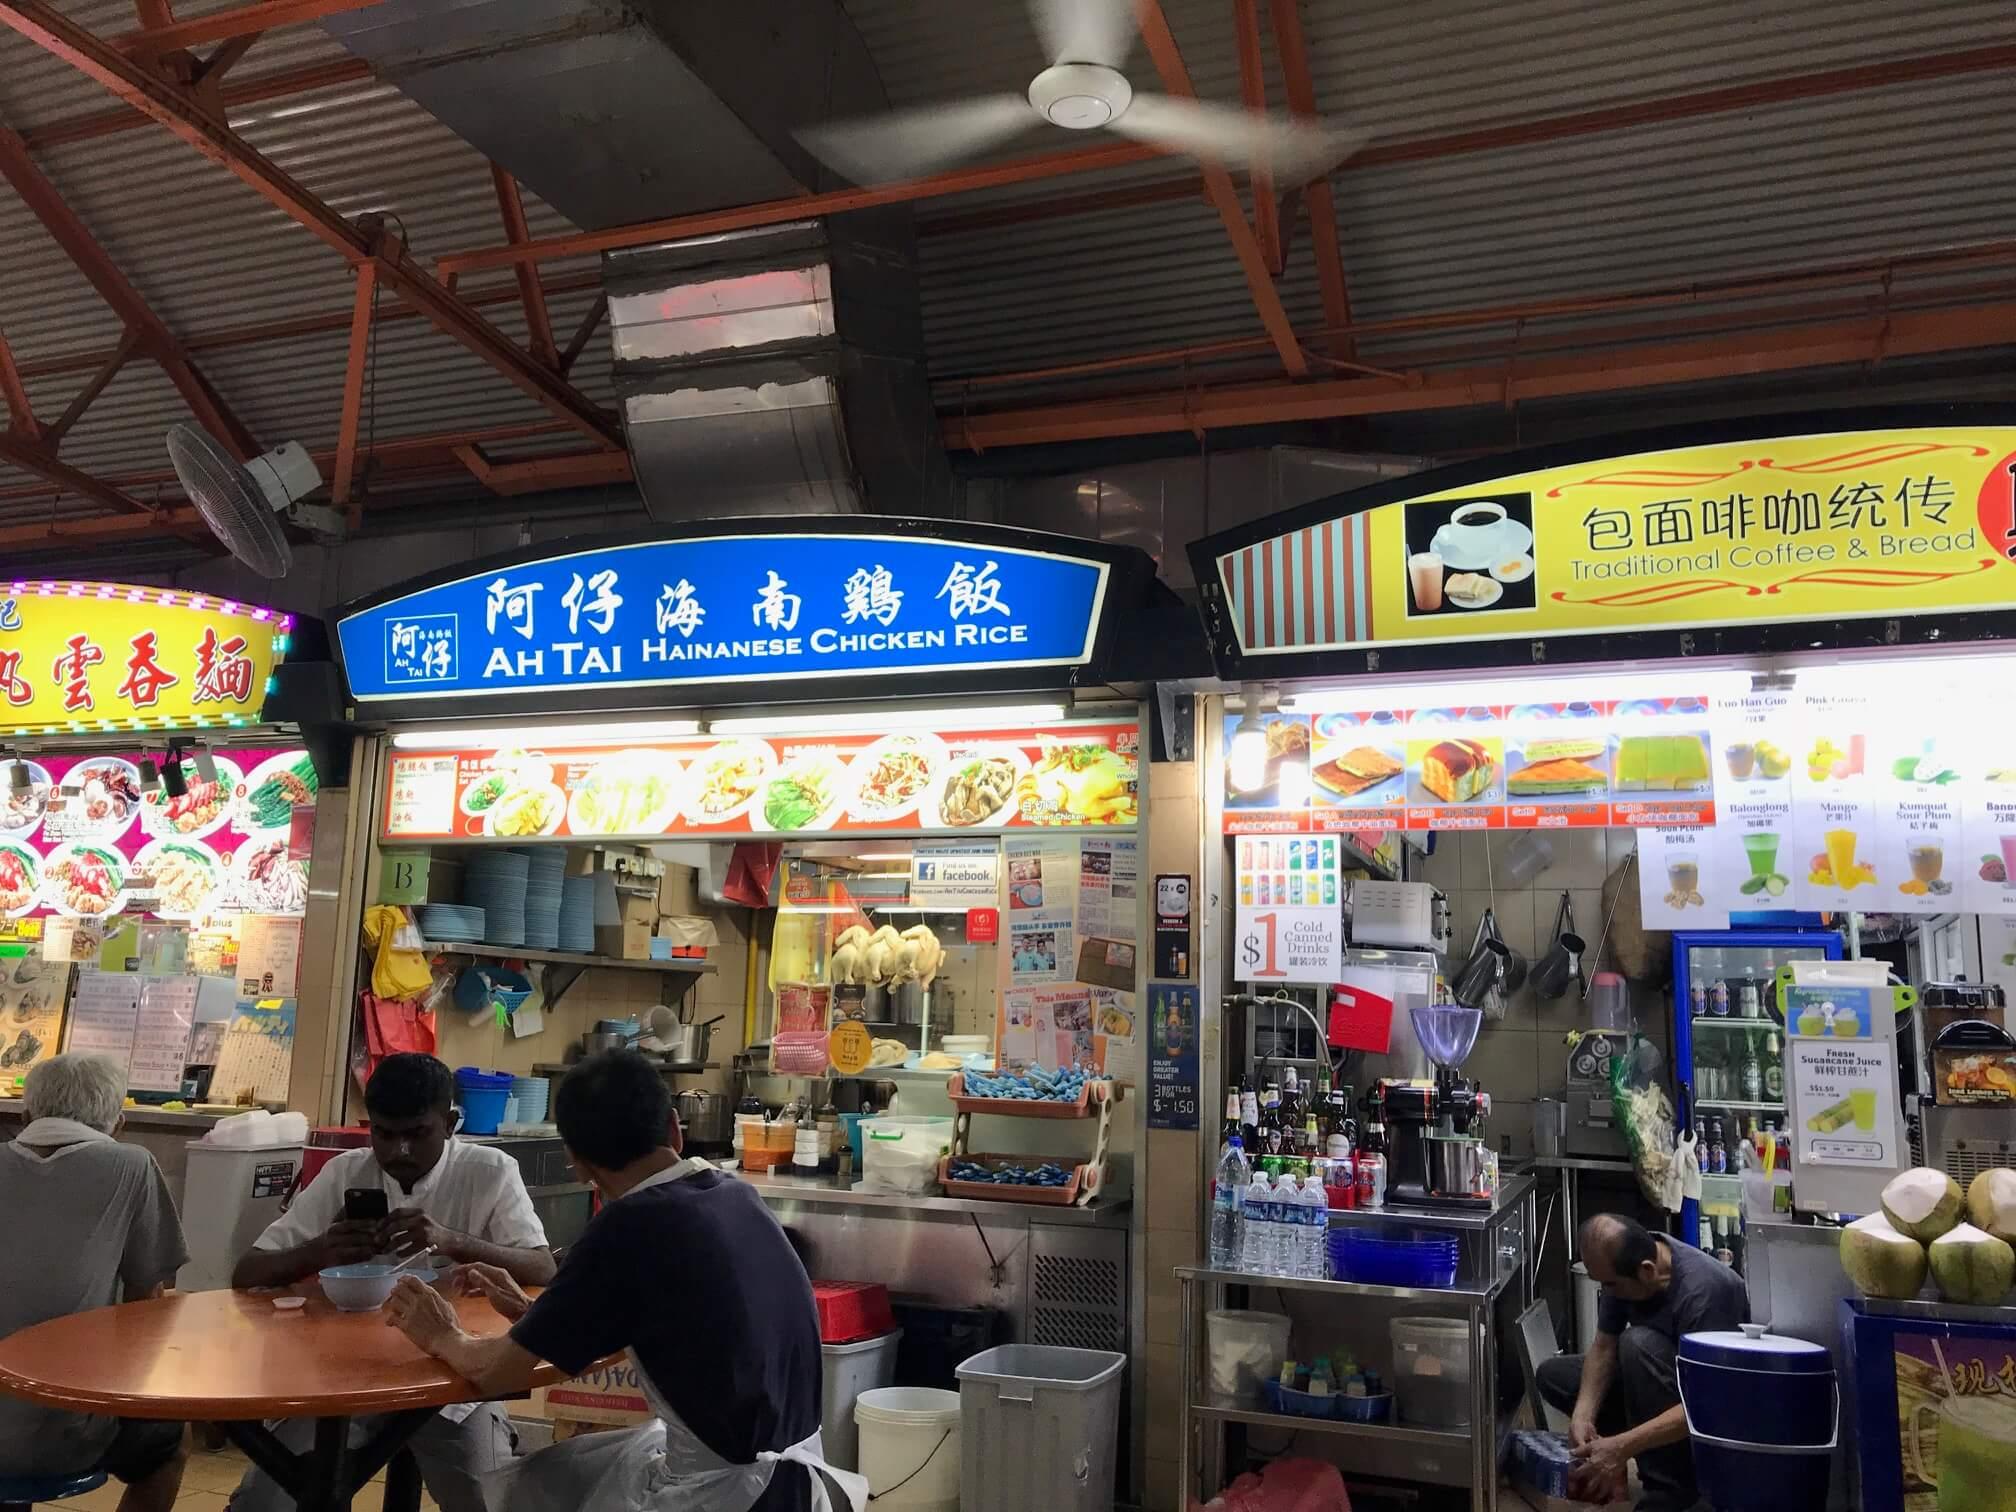 阿仔海南鶏飯(Ah Tai Hainanese Chiken Rice)